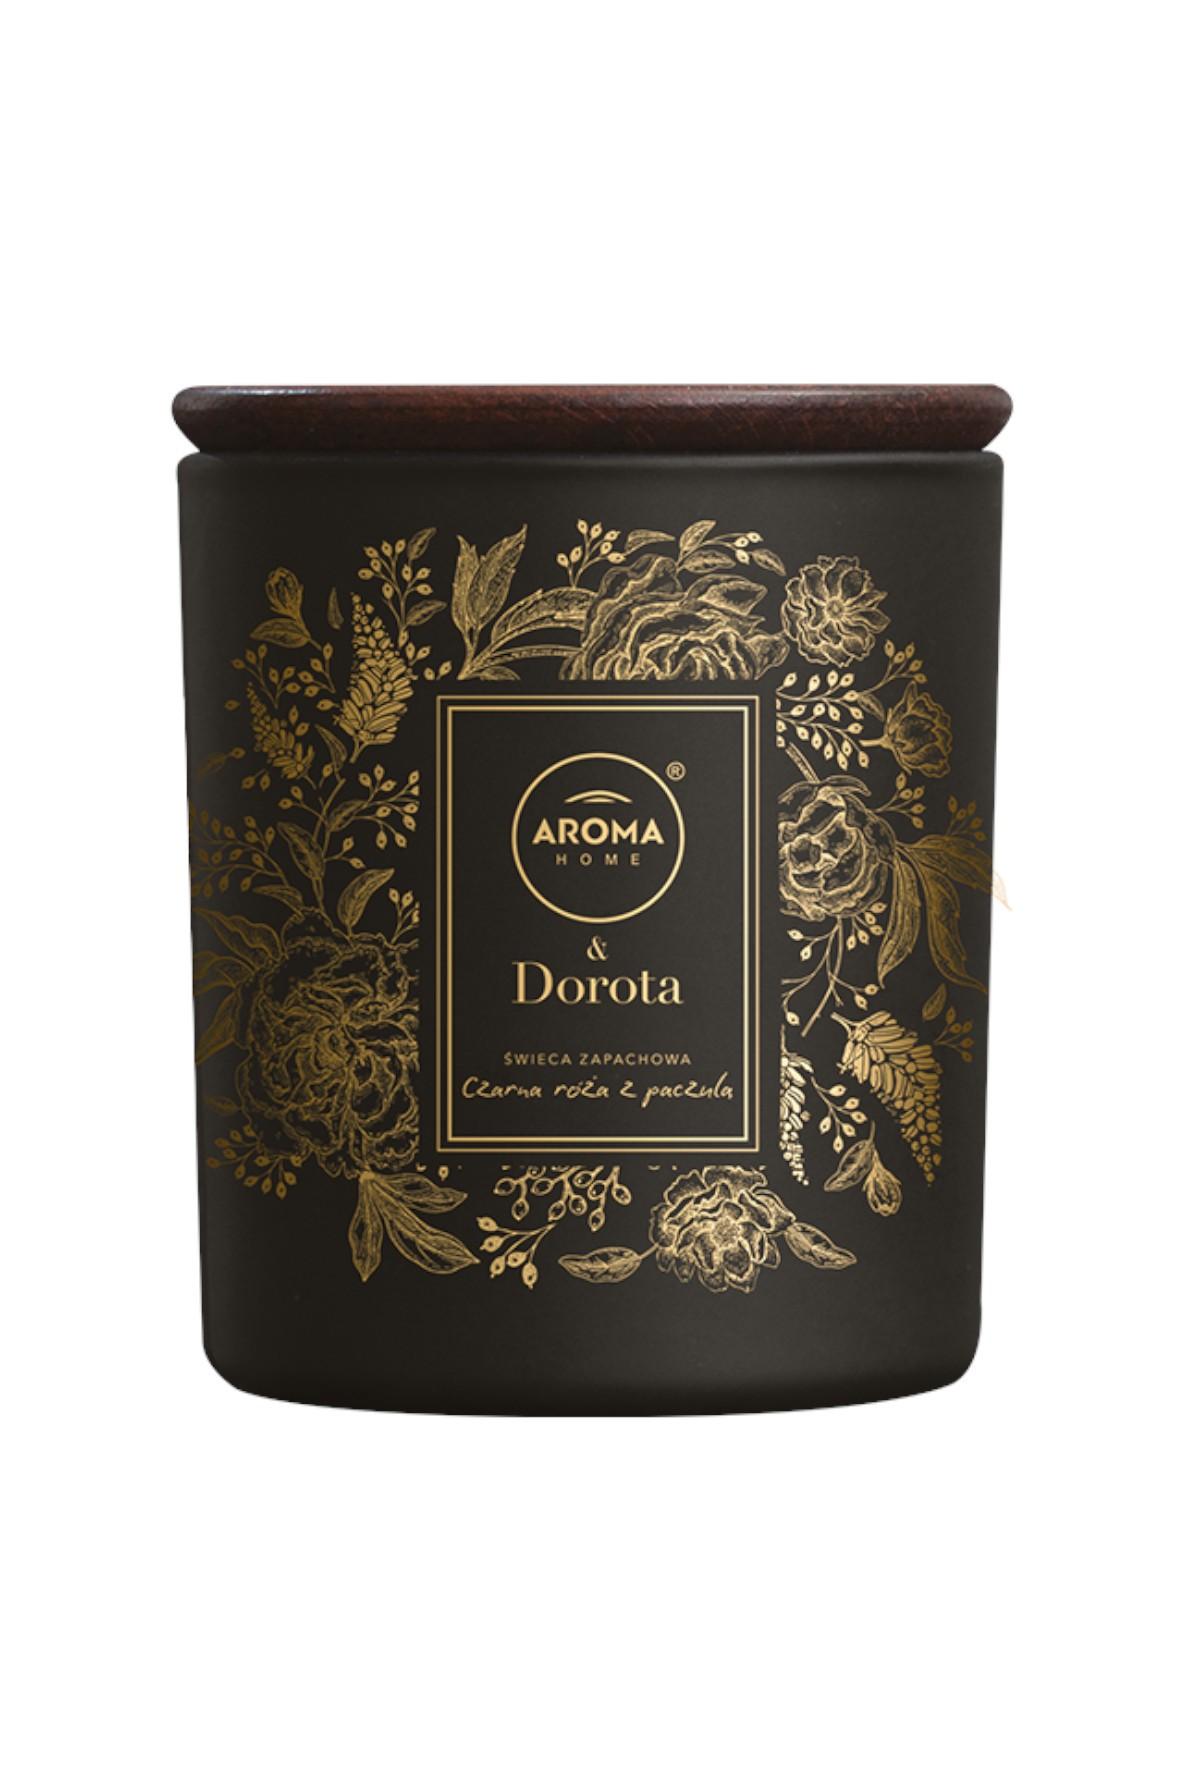 Aroma Home & Dorota Świeca Czarna Róża z Paczulą 260ml/ 150g